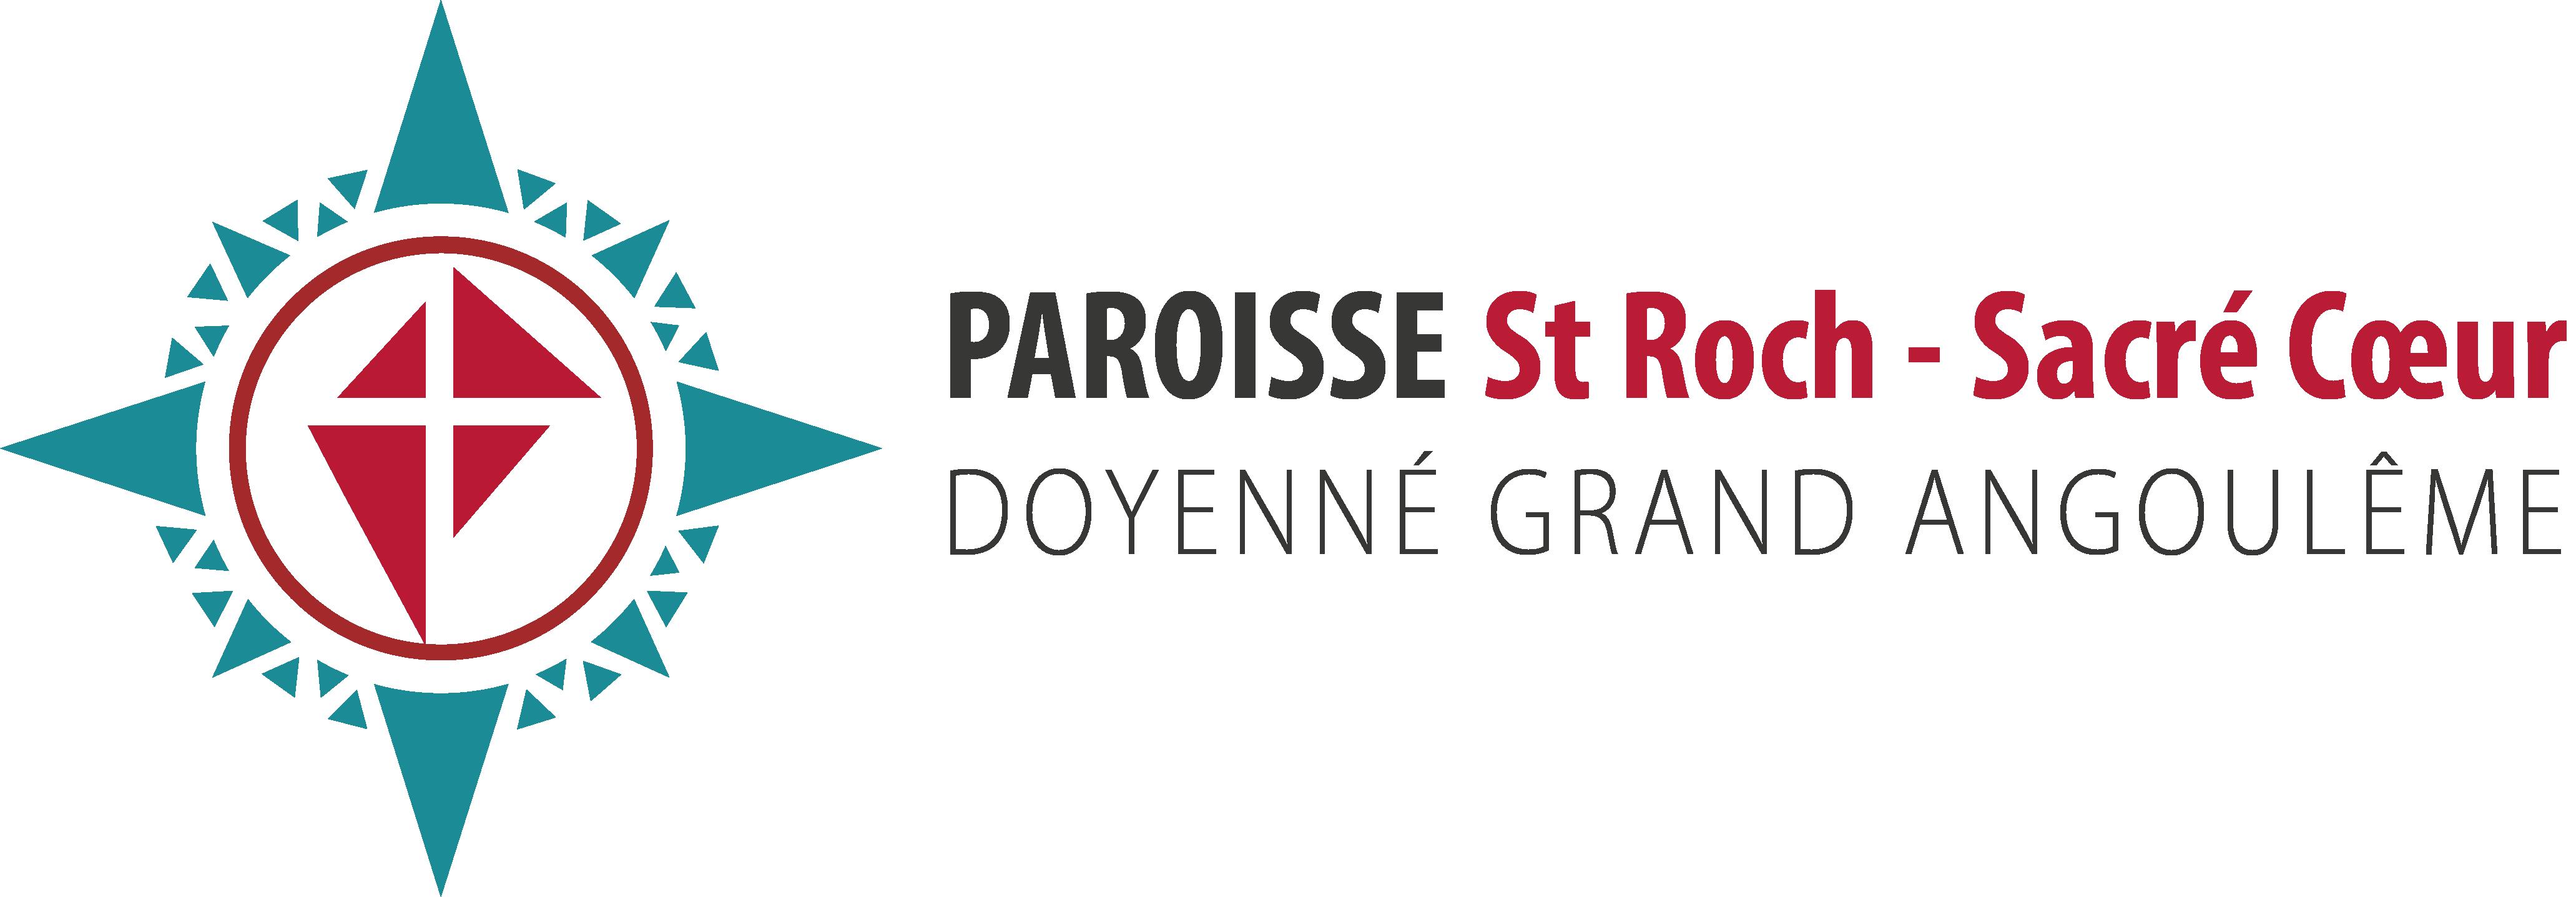 Doyenné Grand Angoulême